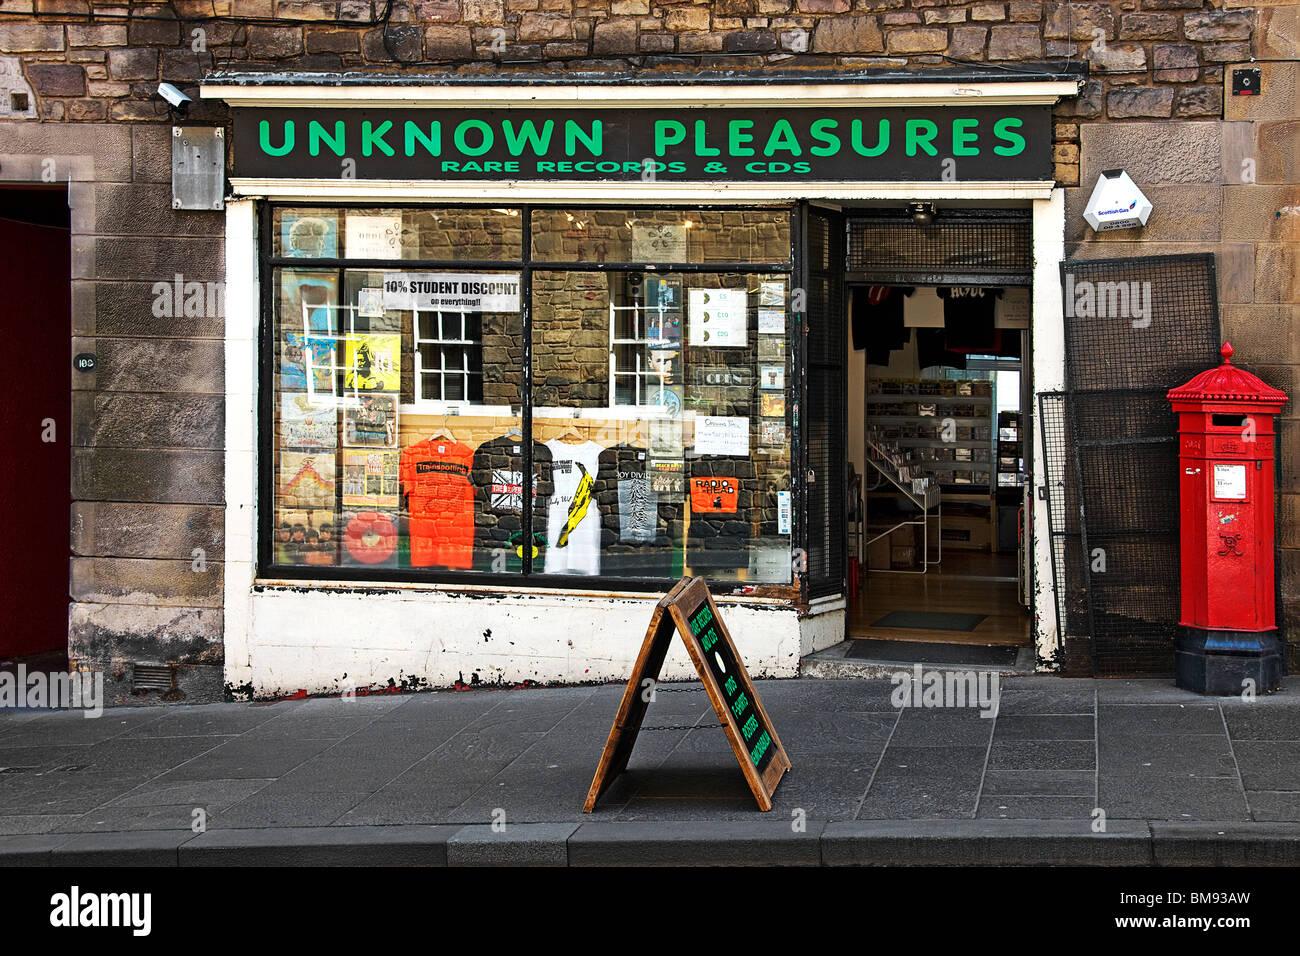 Unknown pleasures. The royal mile. Edinburgh. - Stock Image